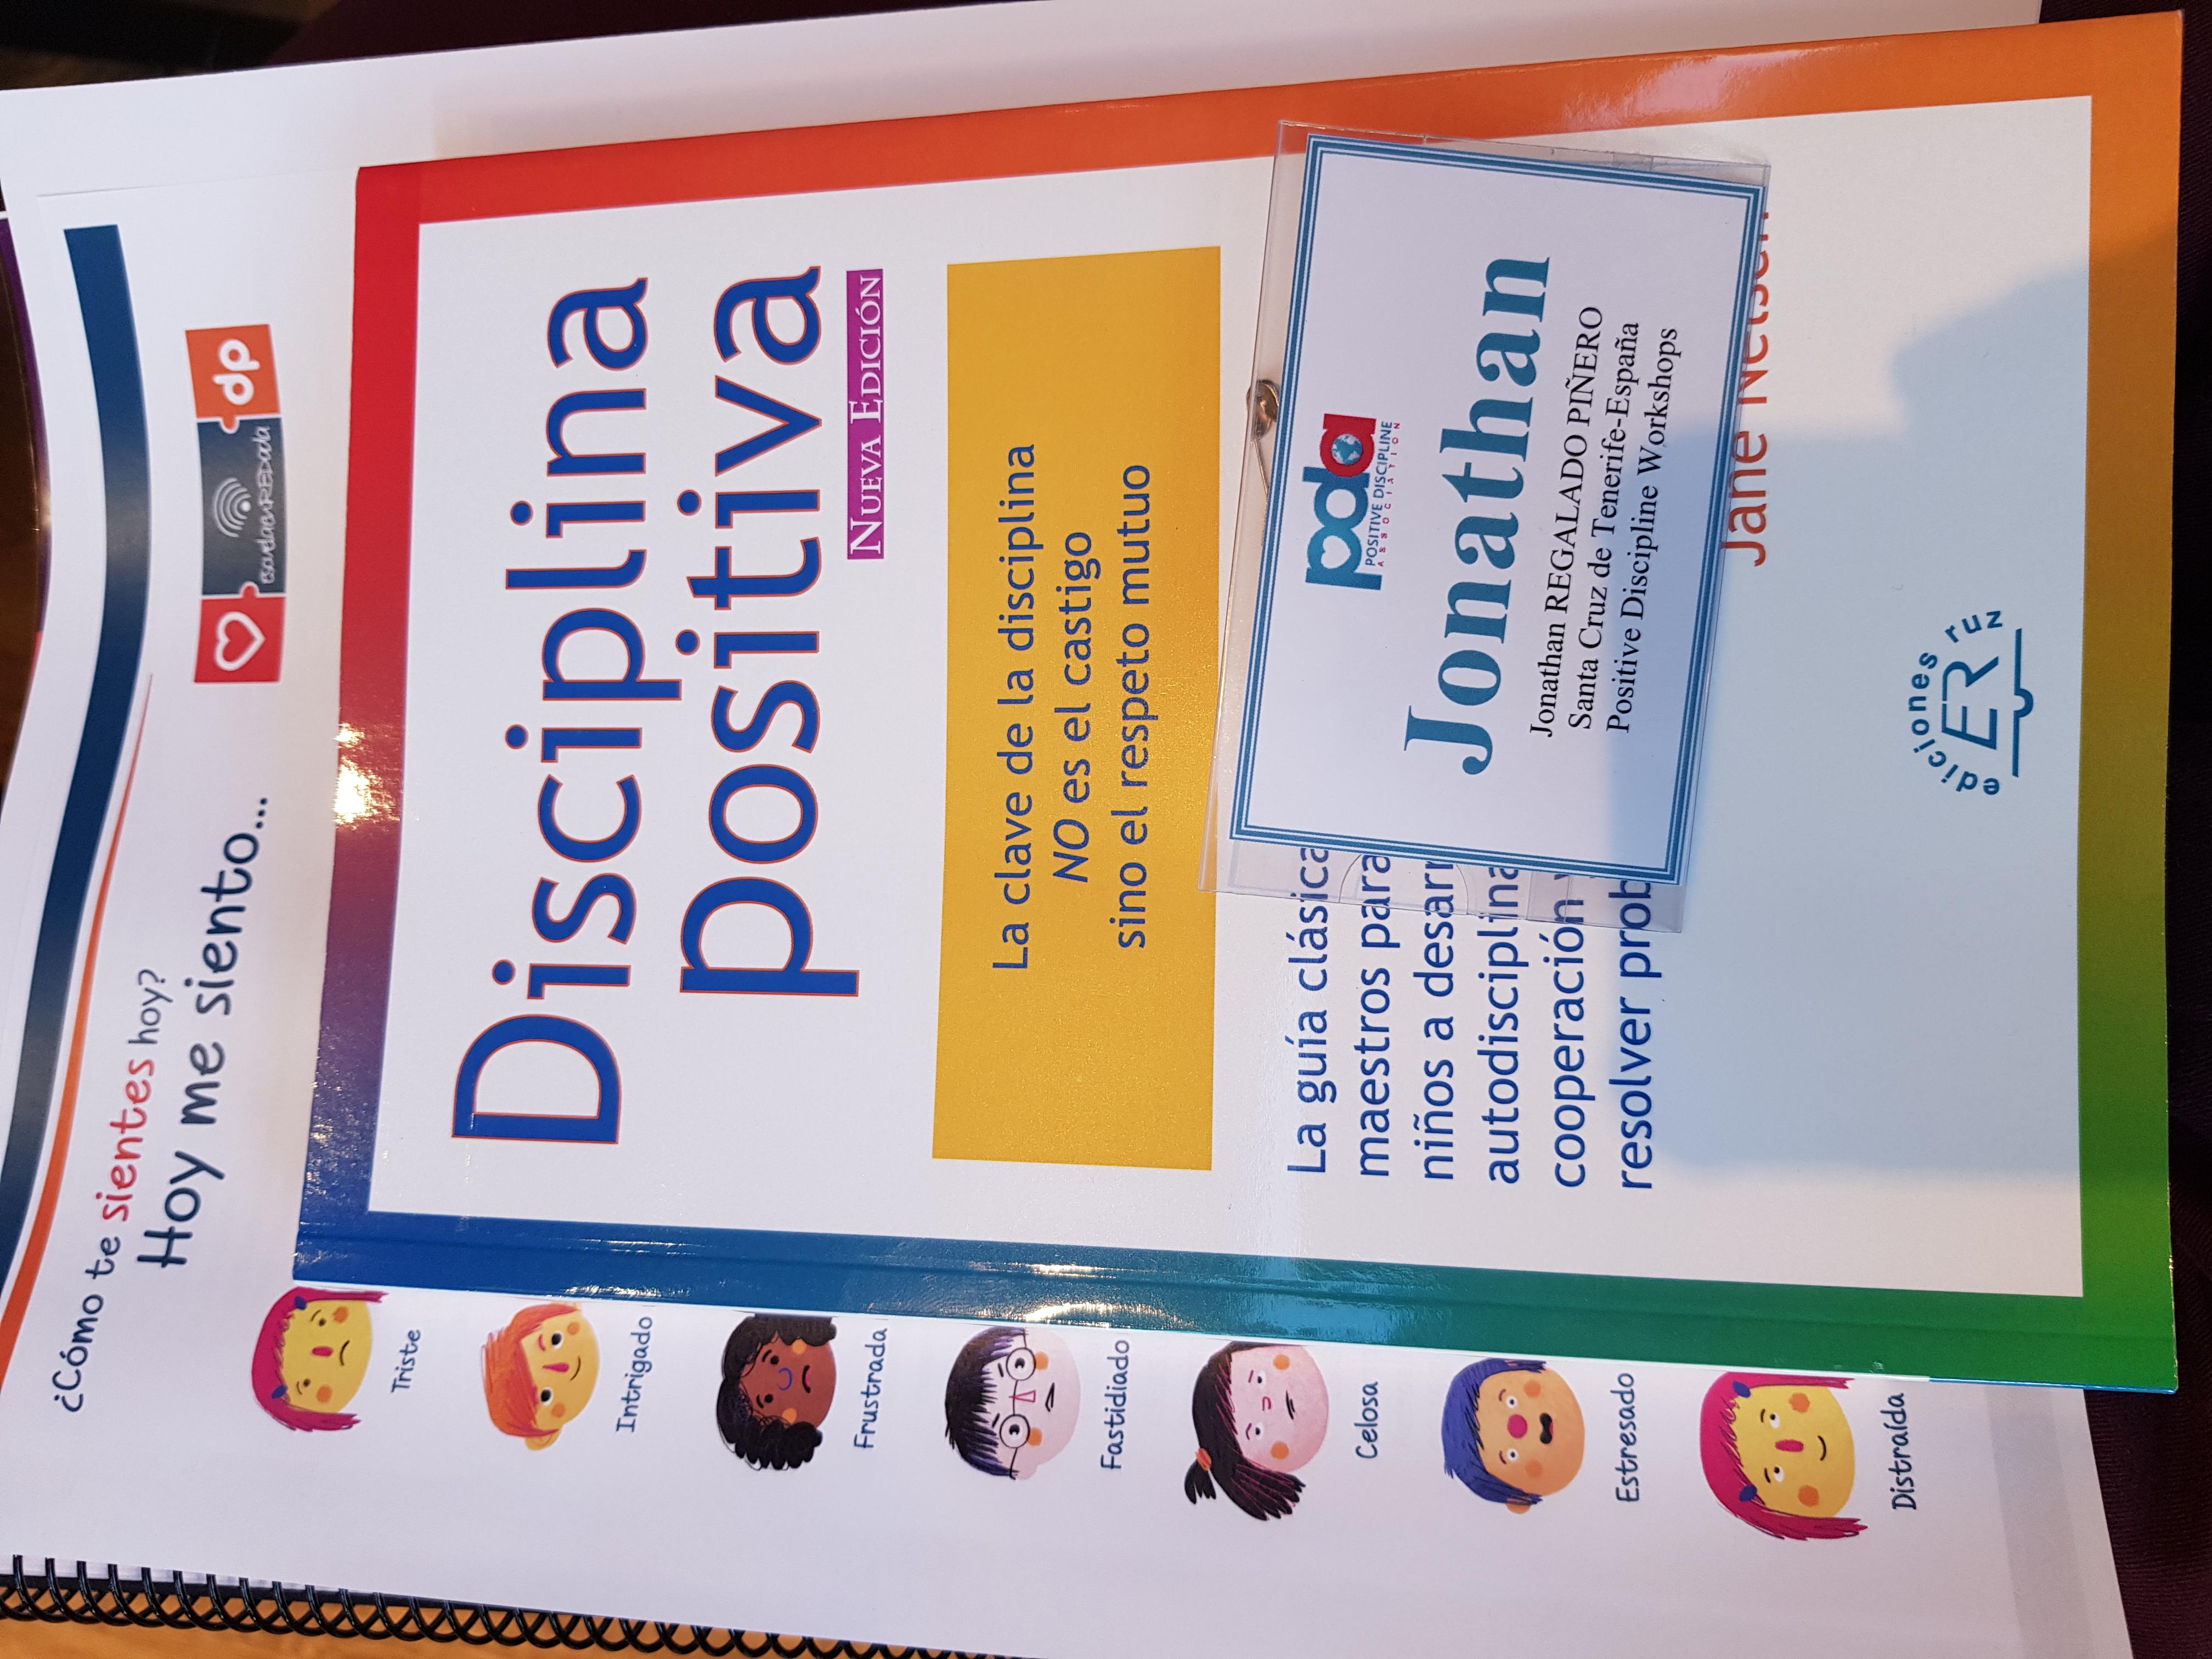 Formación recibida en Disciplina Positiva, 2018